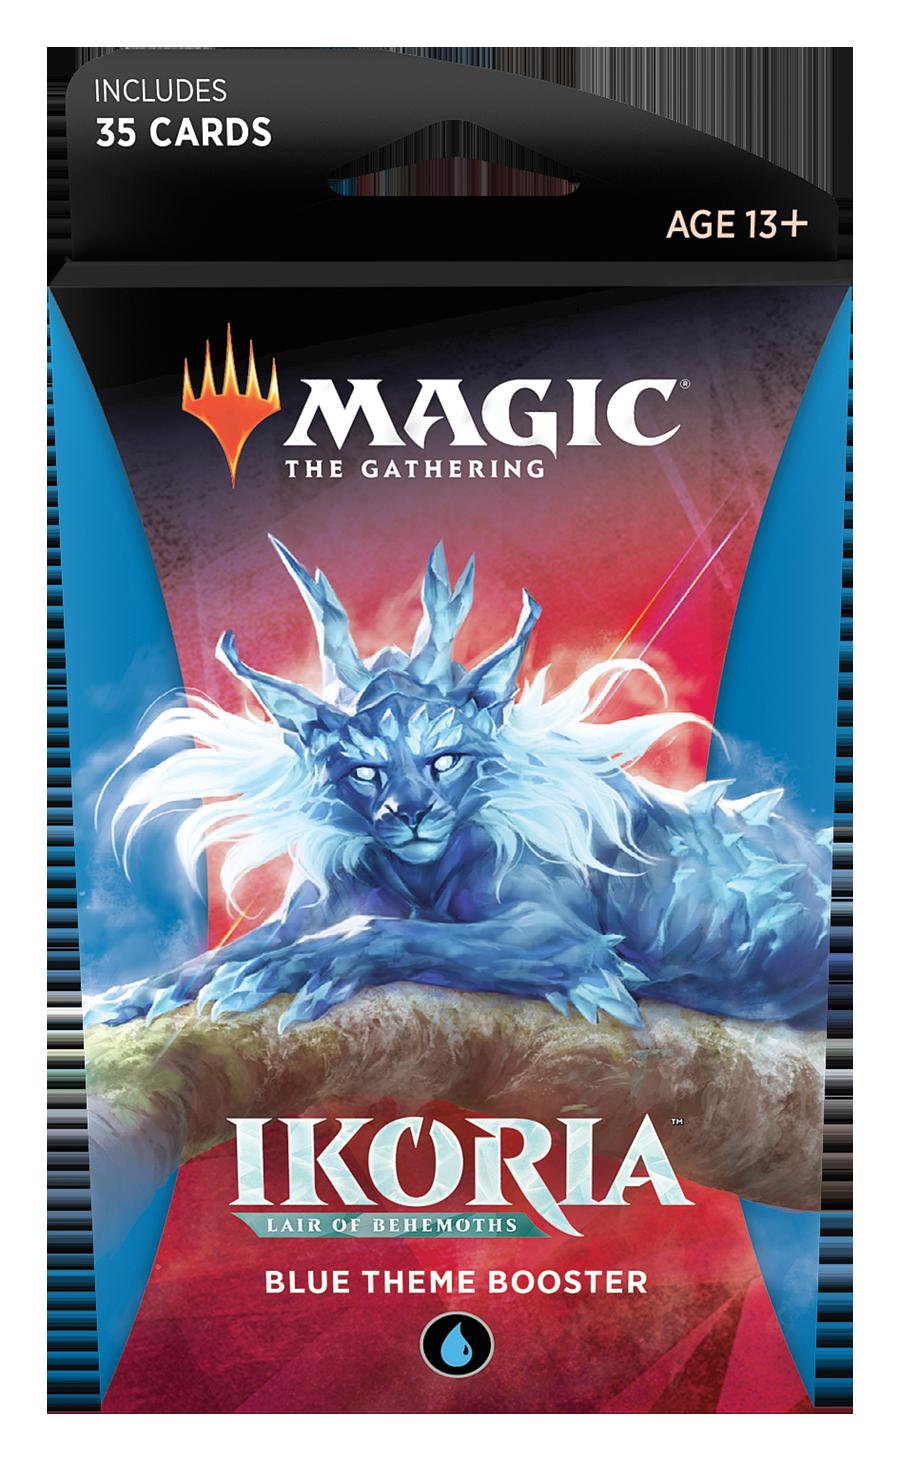 Magic the Gathering: Ikoria: Lair of Behemoths - Theme Booster Blue image